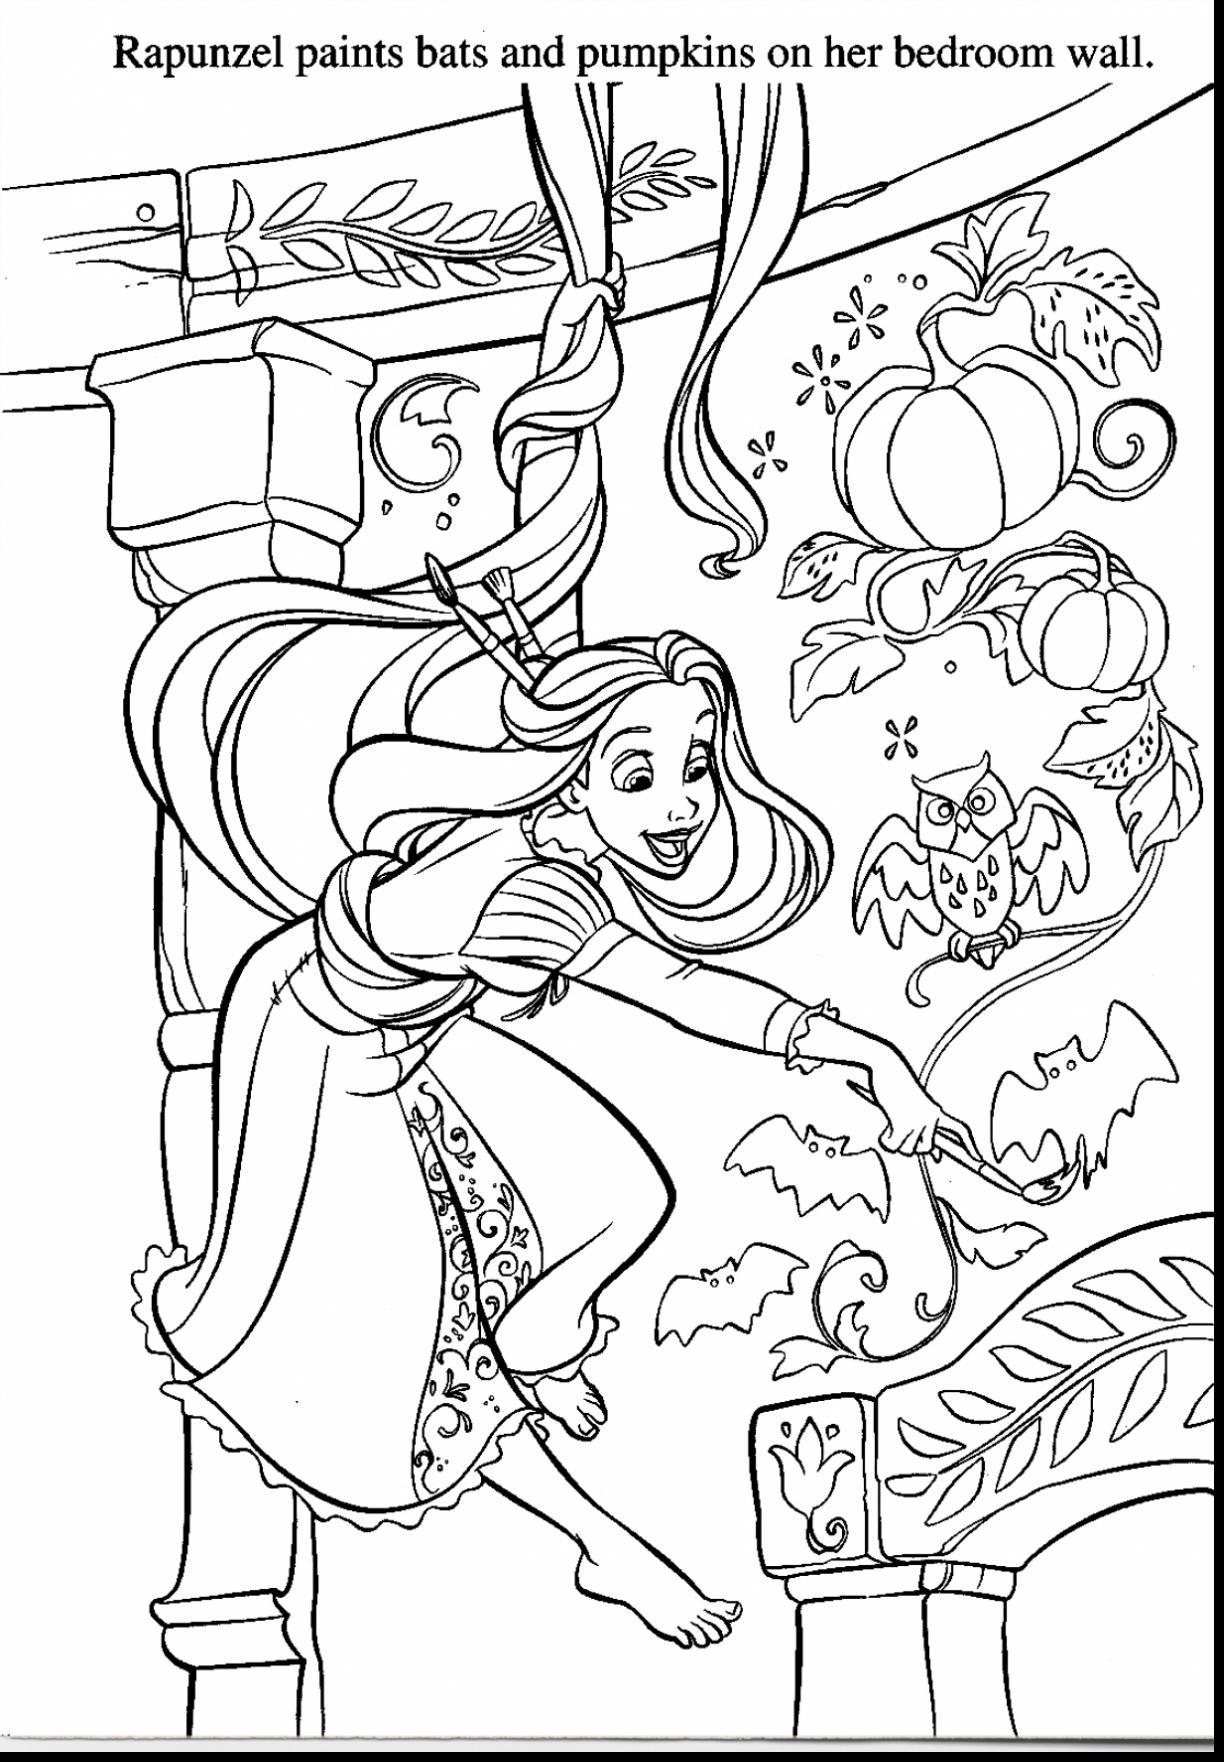 Disney Princess Thanksgiving Coloring Pages at GetDrawings ...